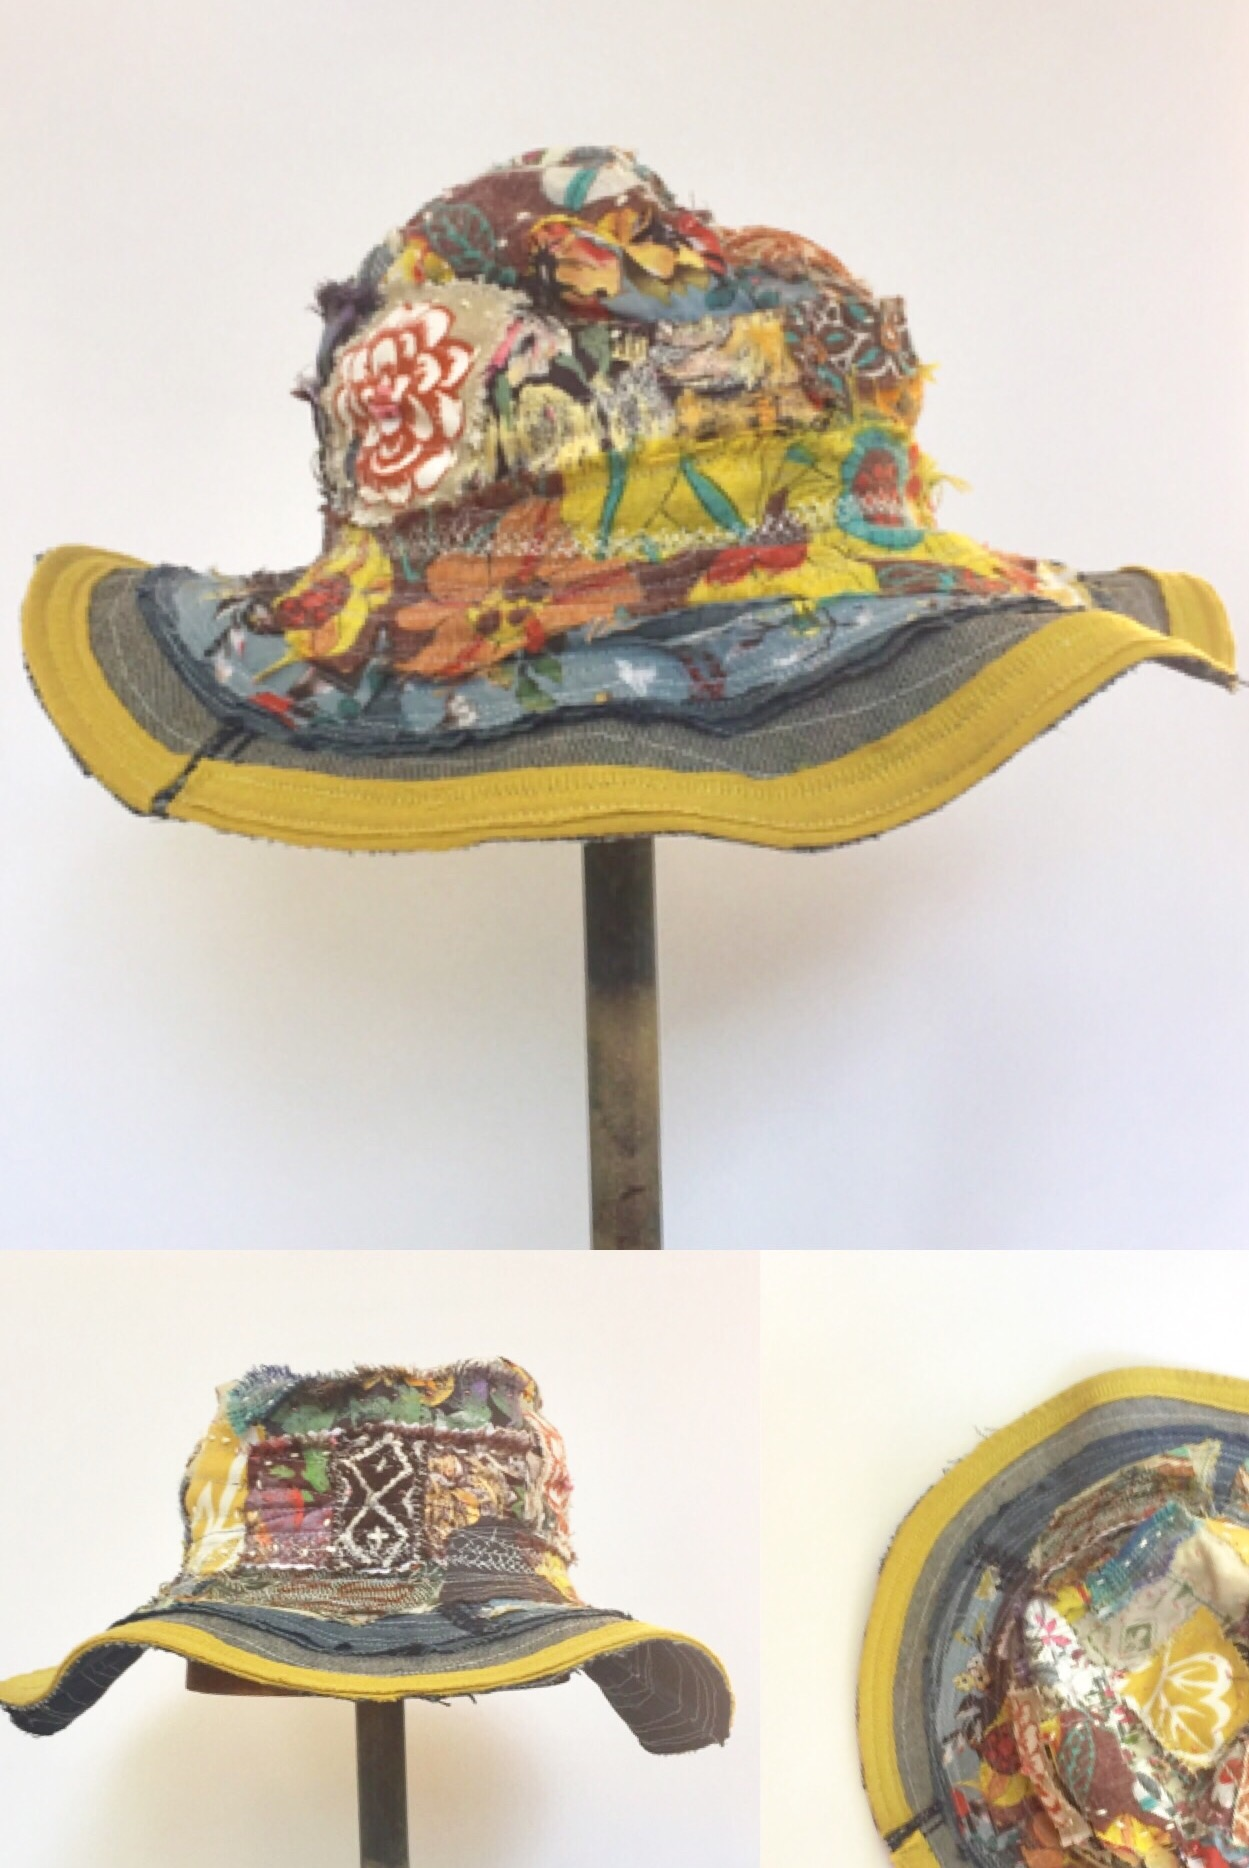 Upcycled Art: Taking the Old and Making It New | Yucandu  |Upcycled Art